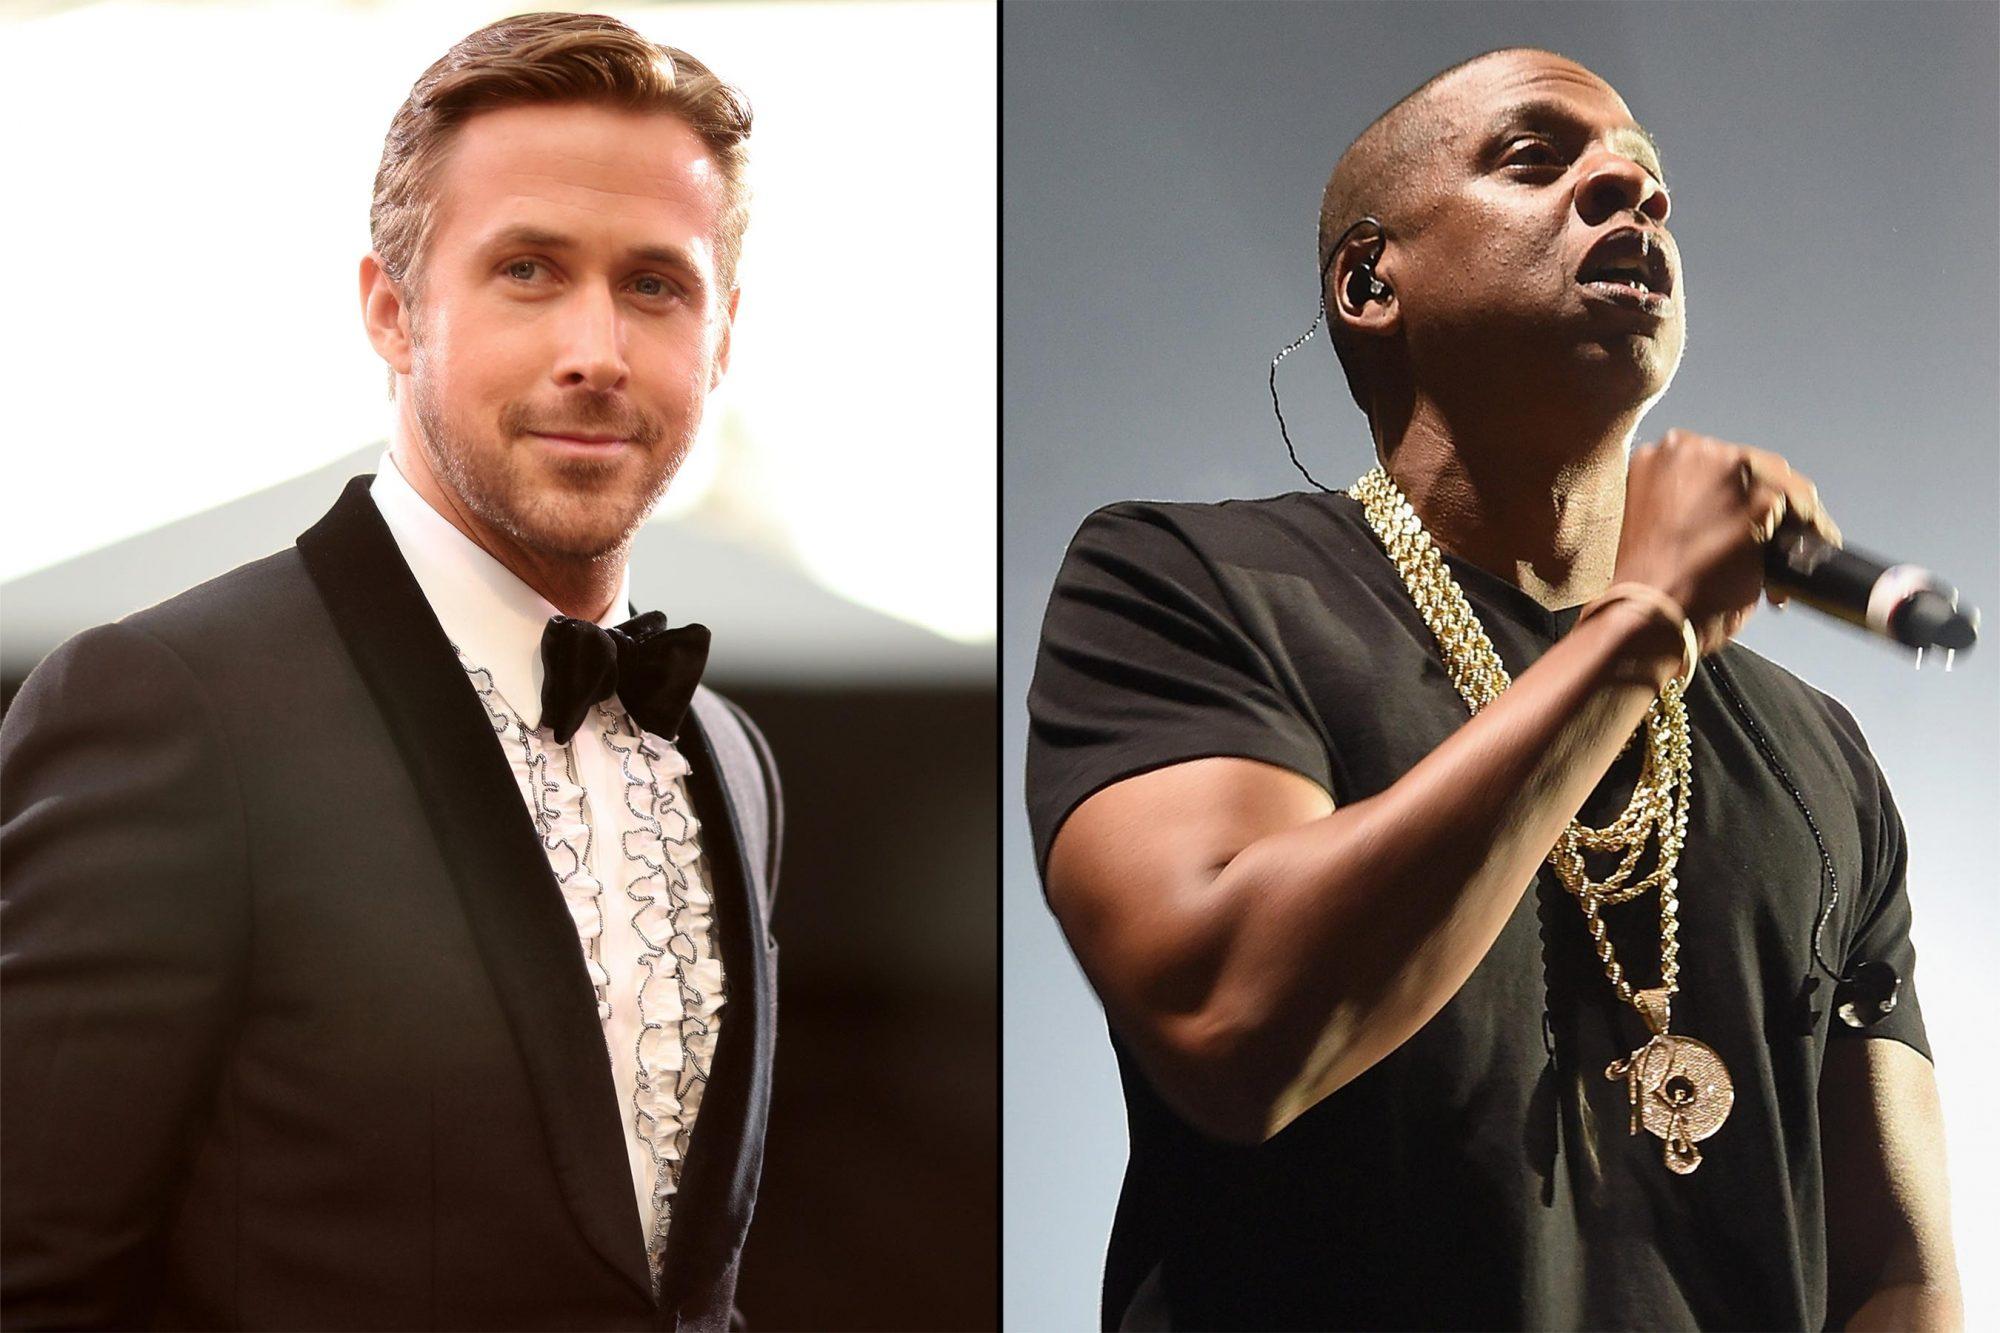 Ryan-Gosling-JAY-Z